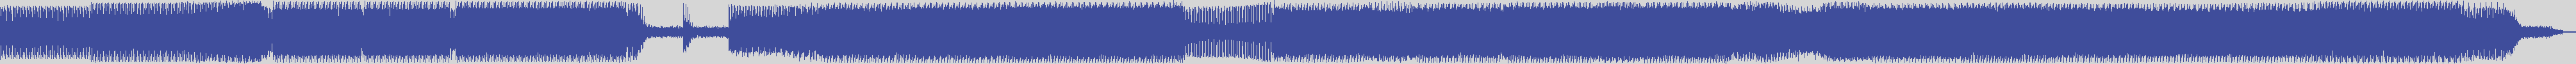 just_digital_records [JS1321] Bardini Experience - Ninetyseventyone [Power Mix] audio wave form